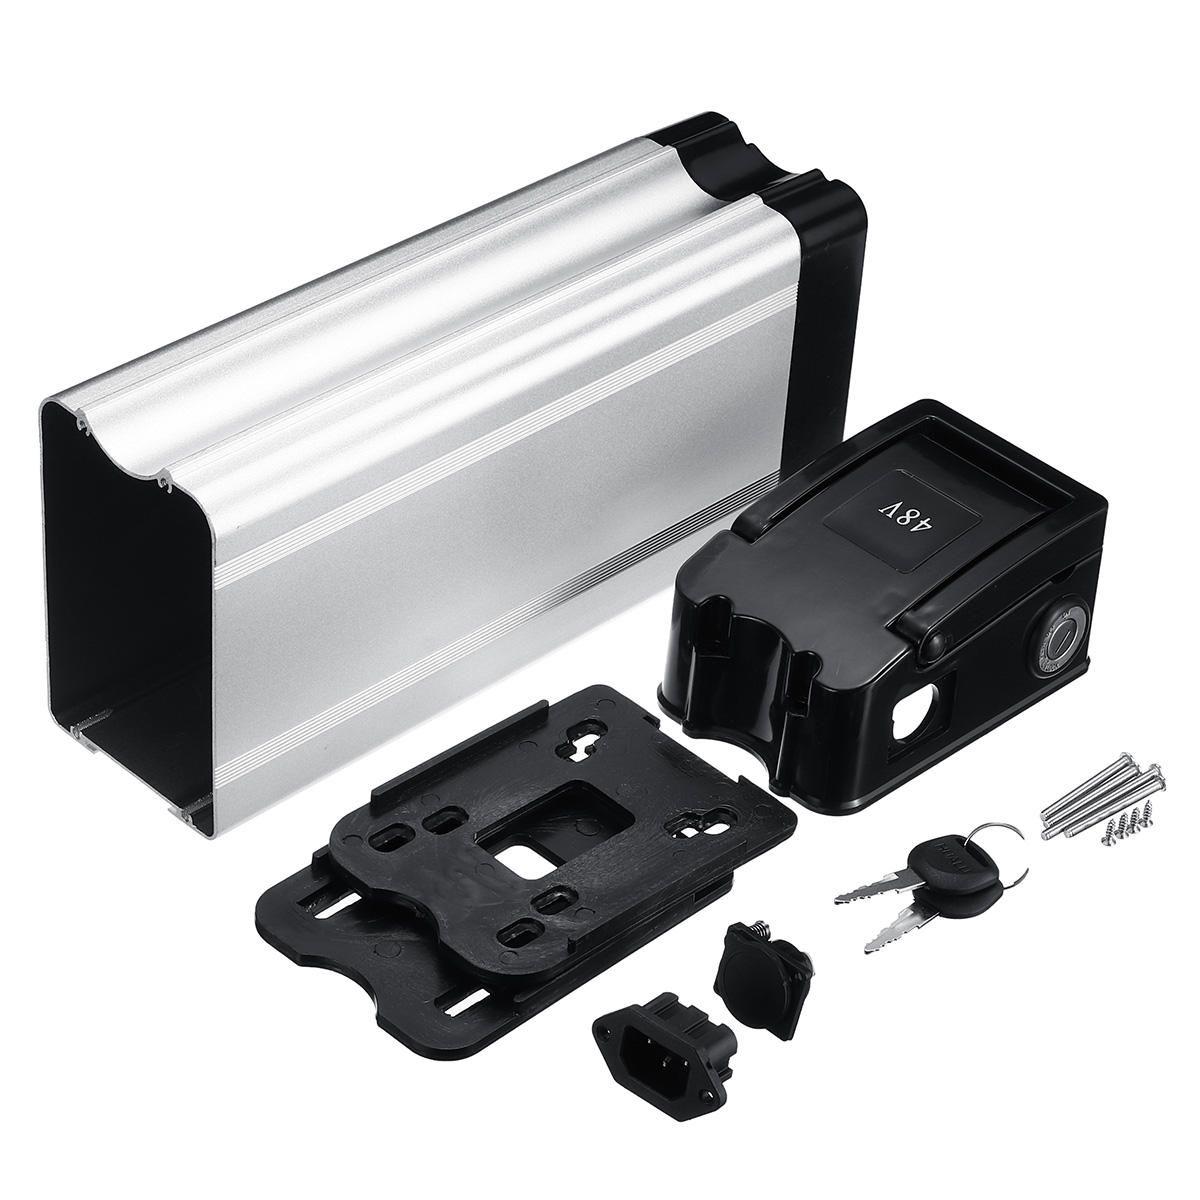 BRF US$37.35 BIKIGHT Electric Battery Storage Box Case E-bike Box Holder For 18650 36V/48V Battery